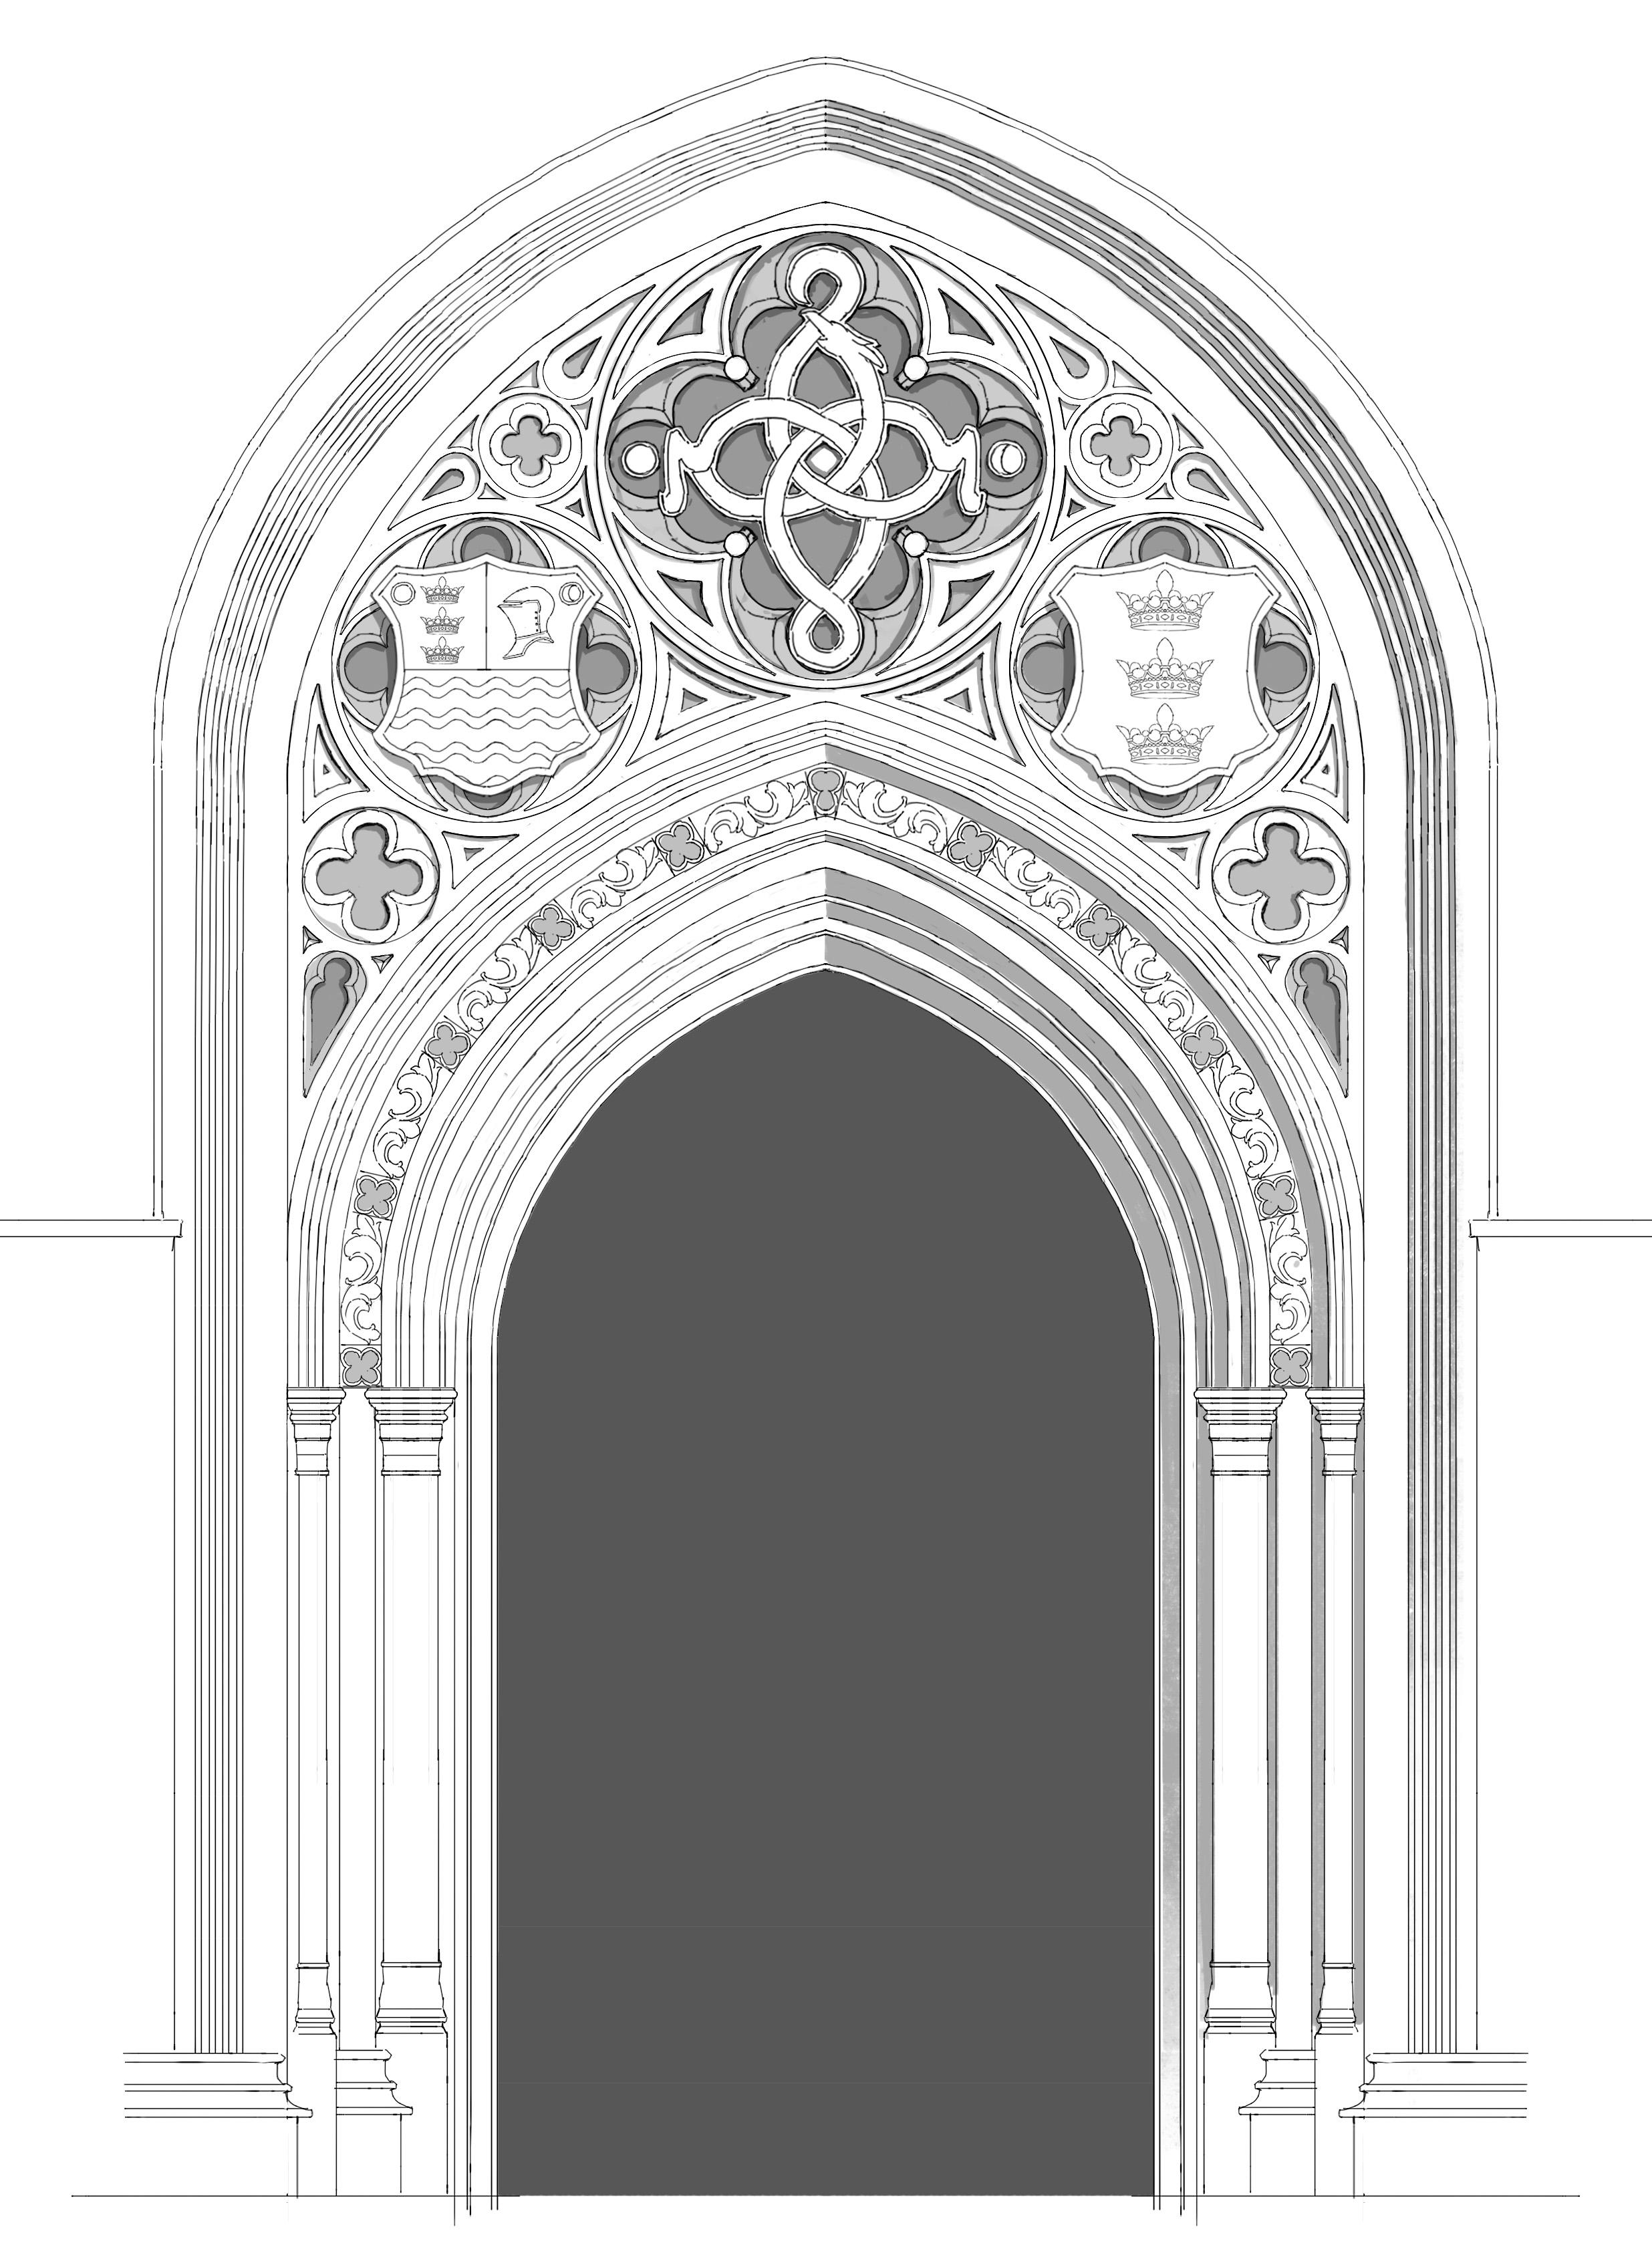 knight_council_entrance.jpg